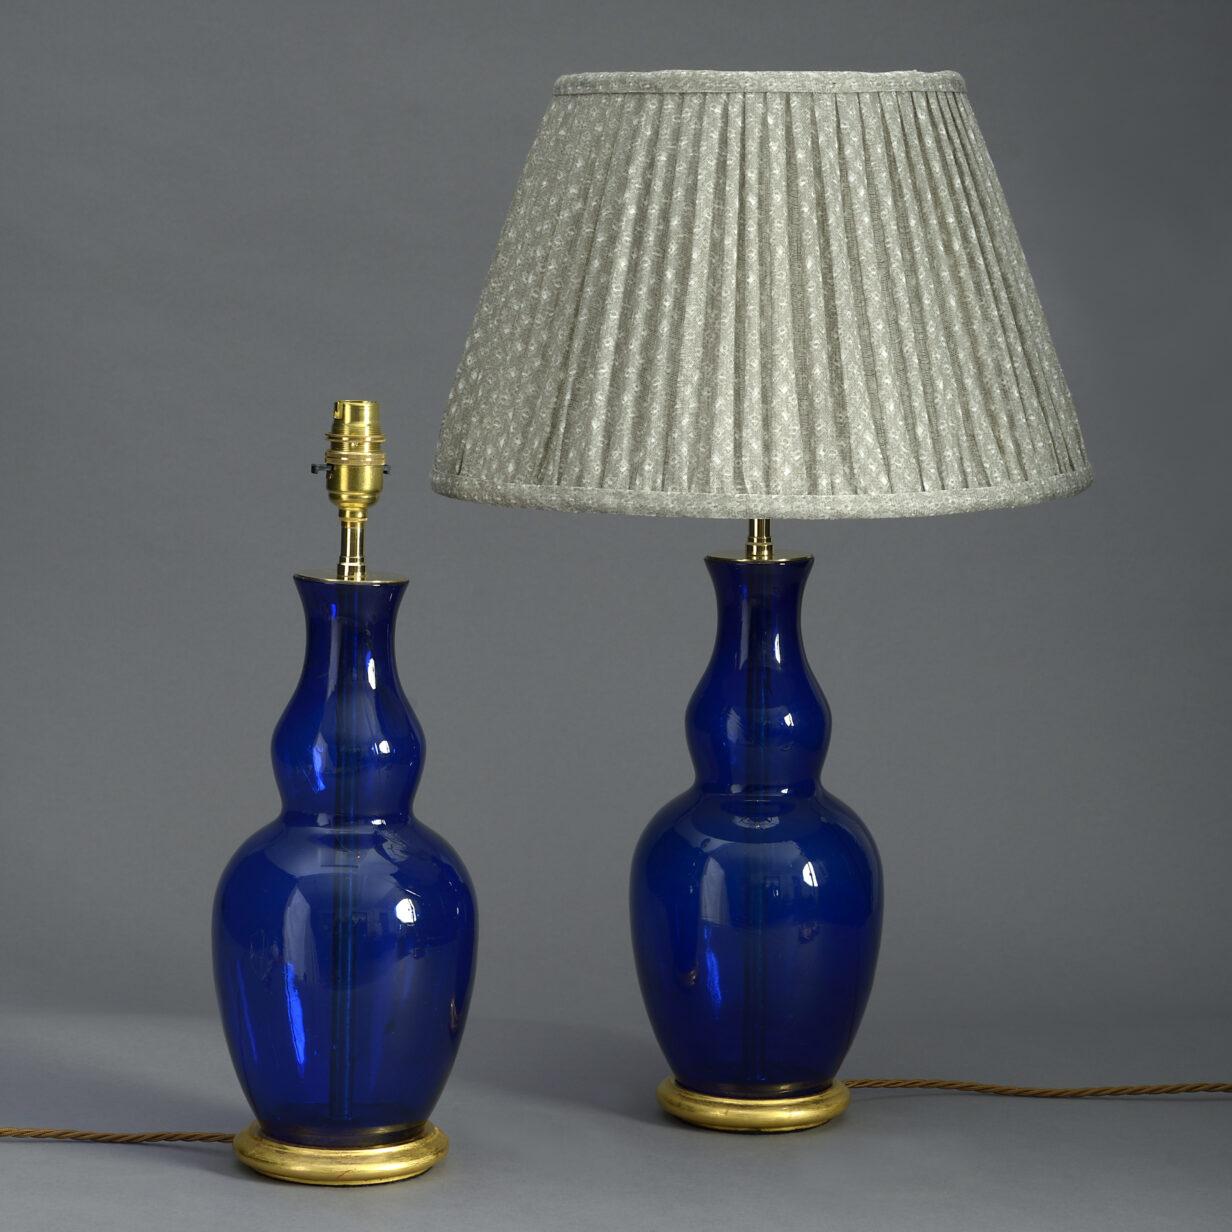 Pair of Bristol Blue Glass Vase Lamps